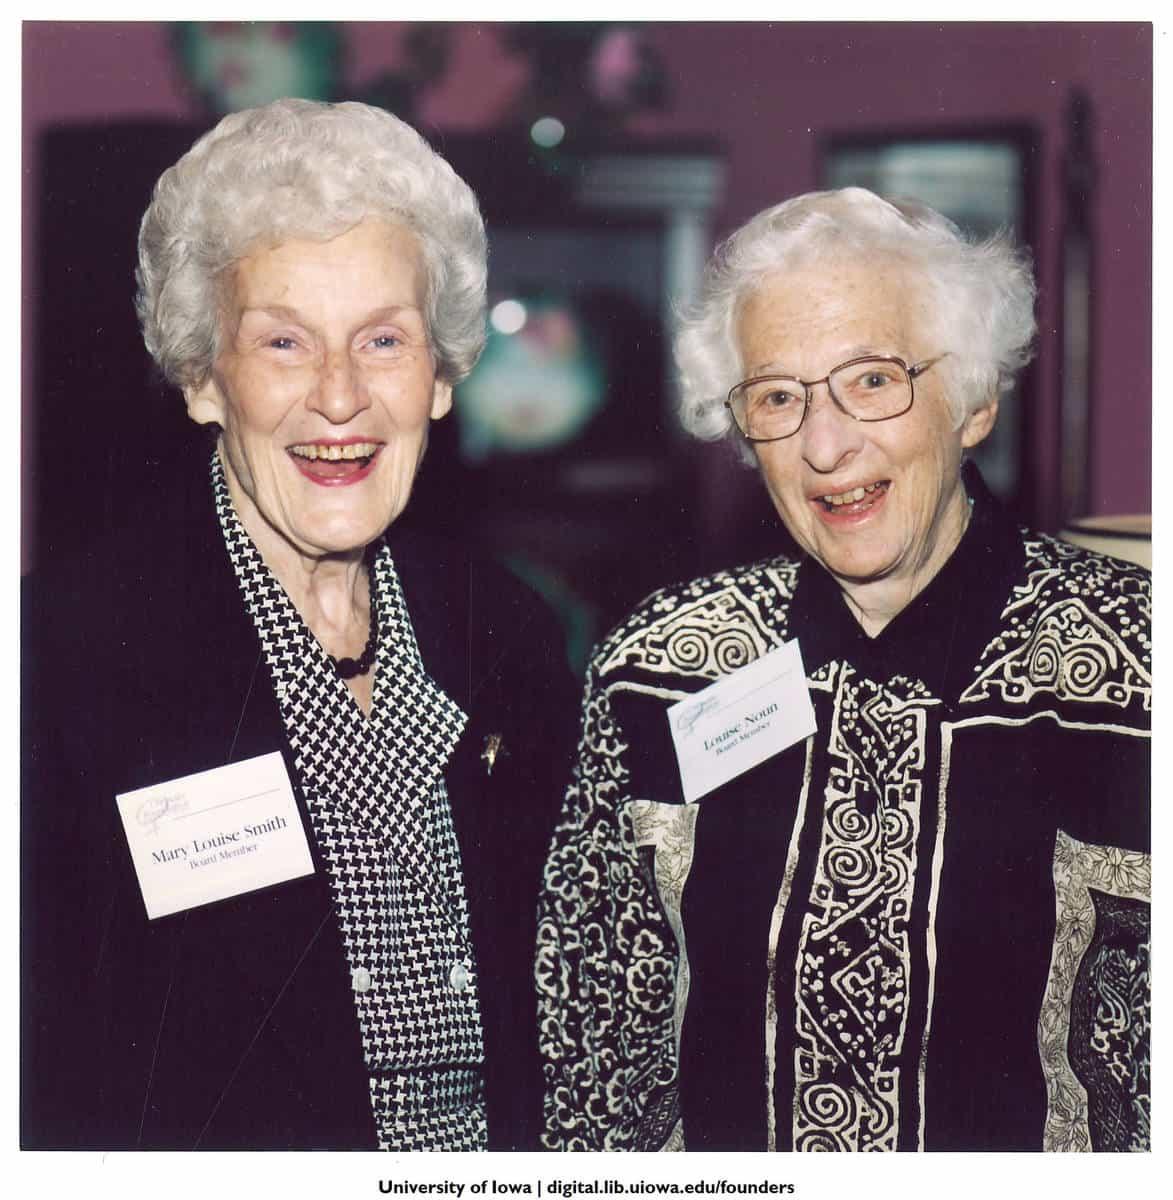 Mary Louise Smith and Louise Noun, Des Moines, Iowa, October 1, 1996. University of Iowa Libraries. Iowa Women's Archives.